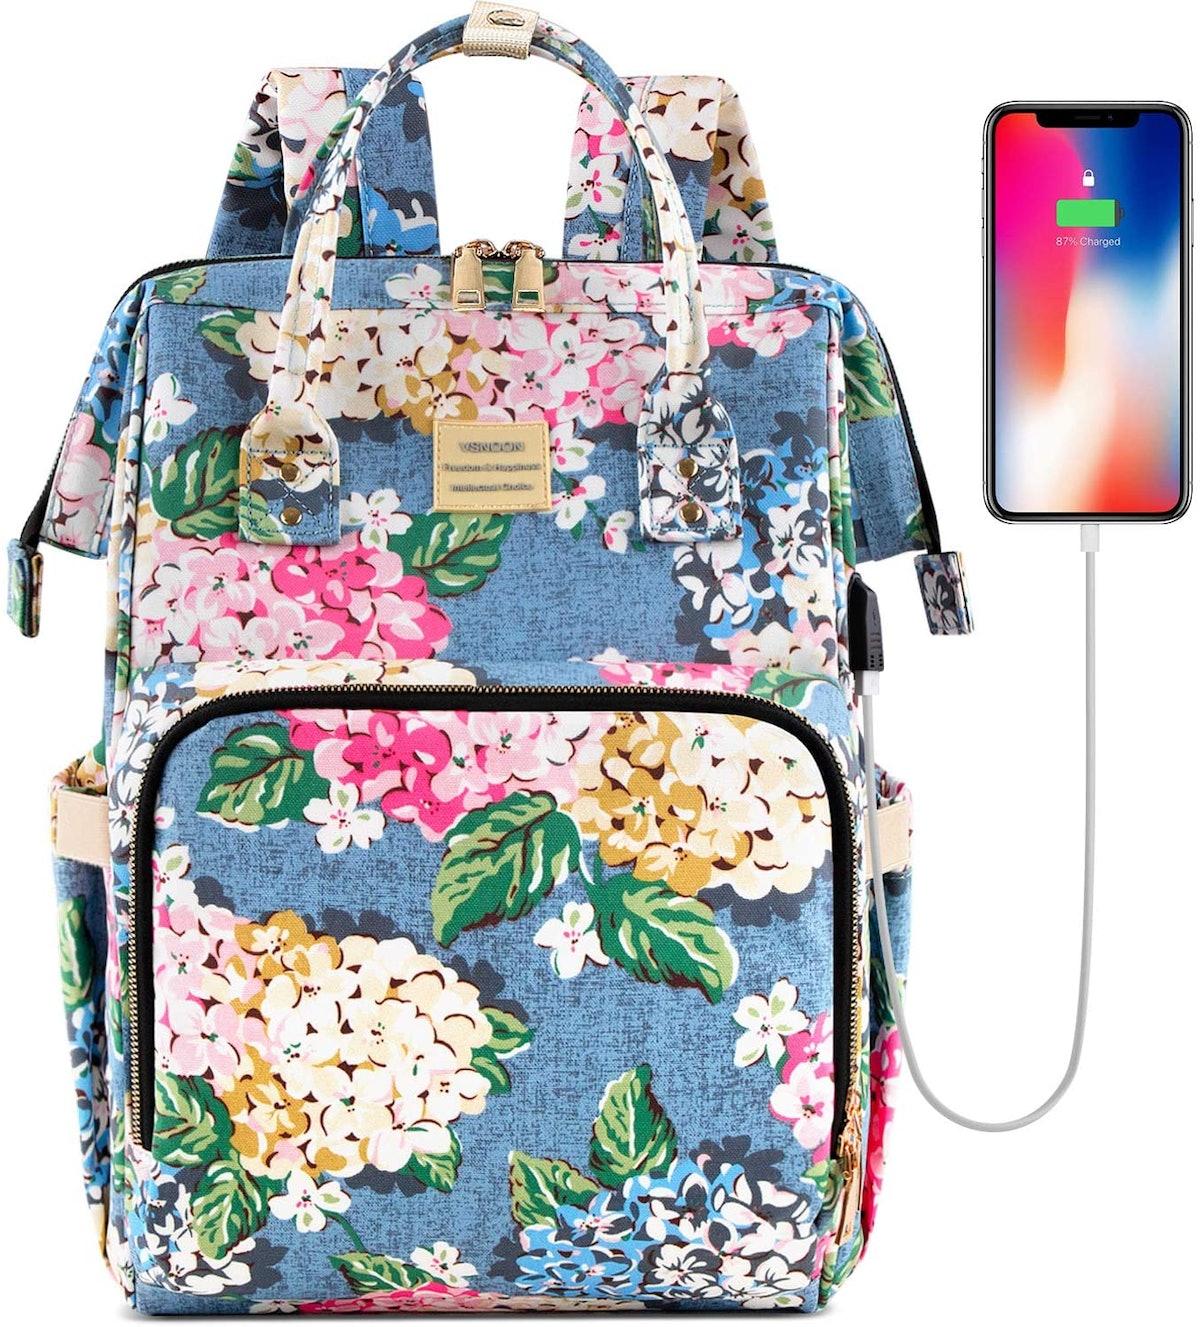 VSNOON Backpack